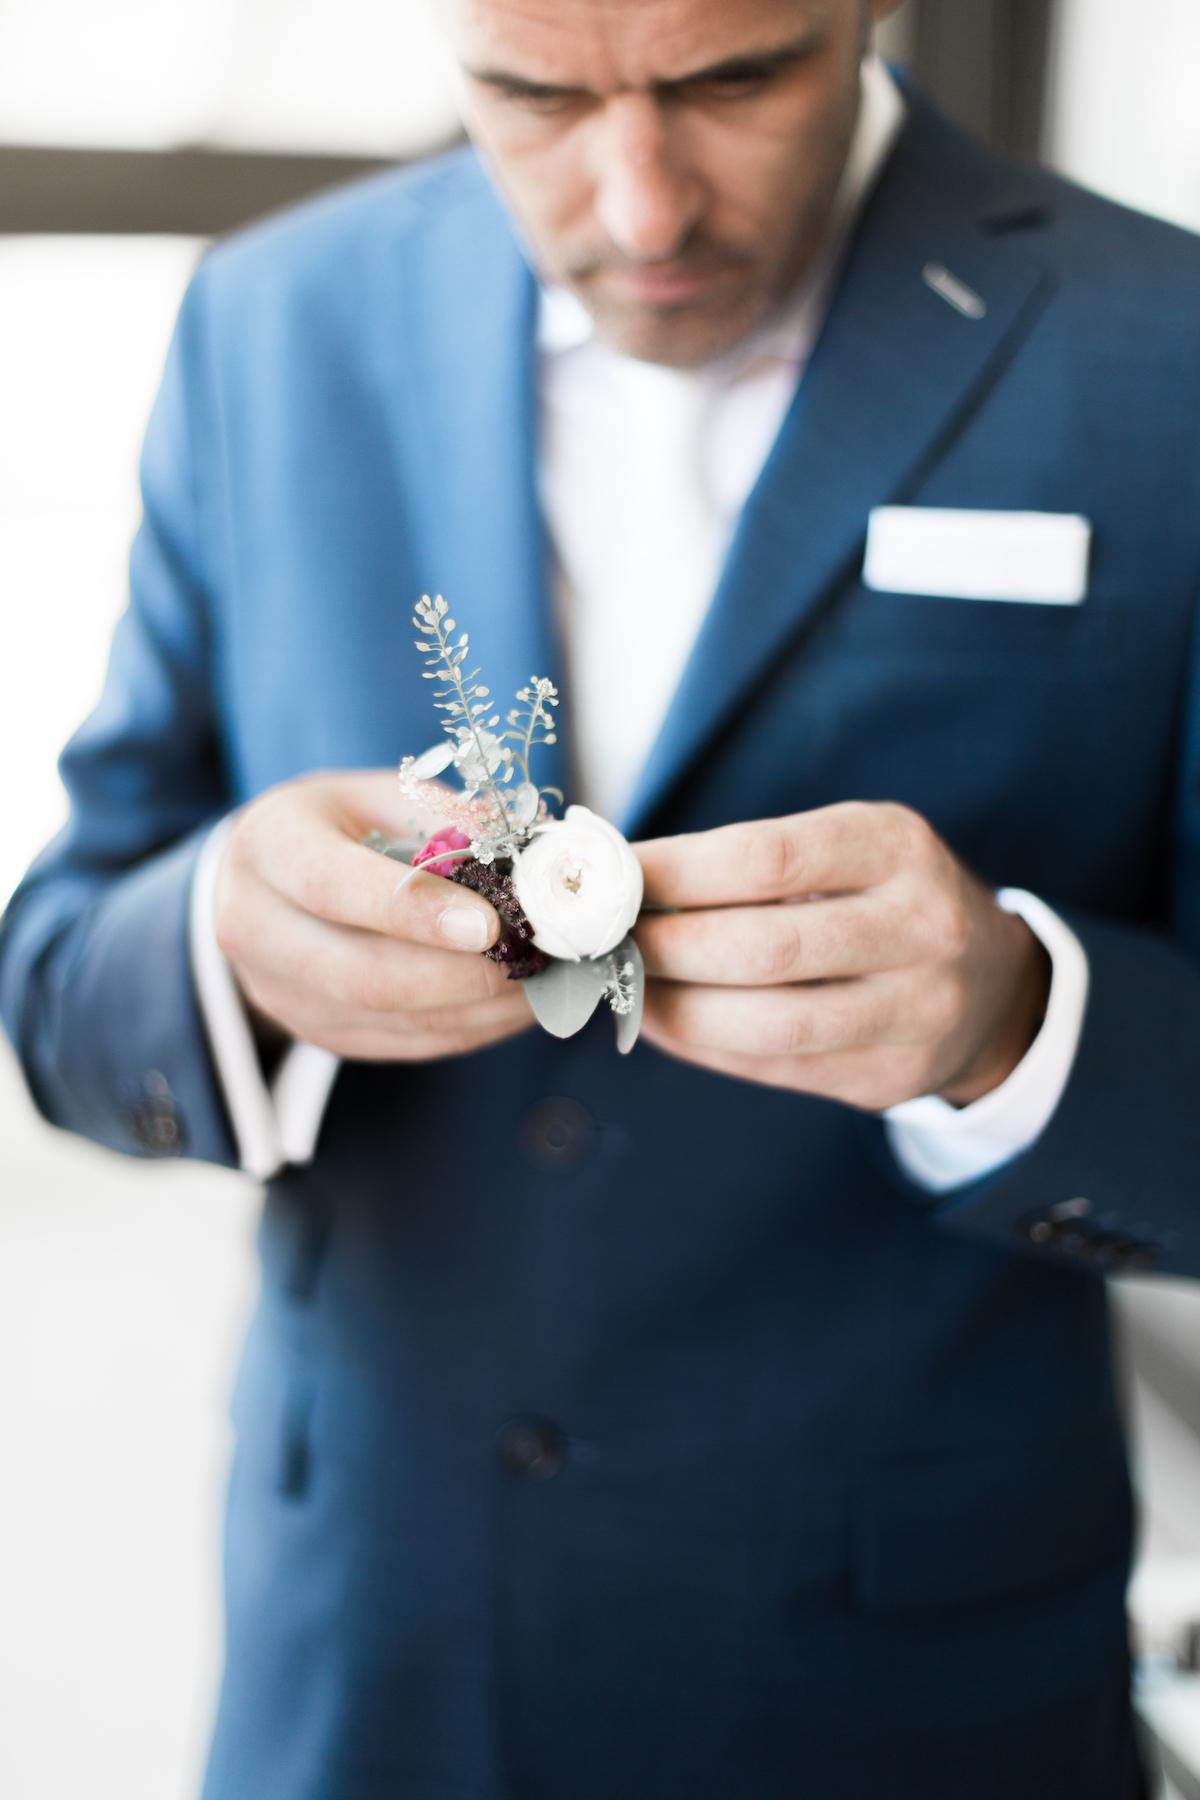 annecy-wedding-photos-57.jpg